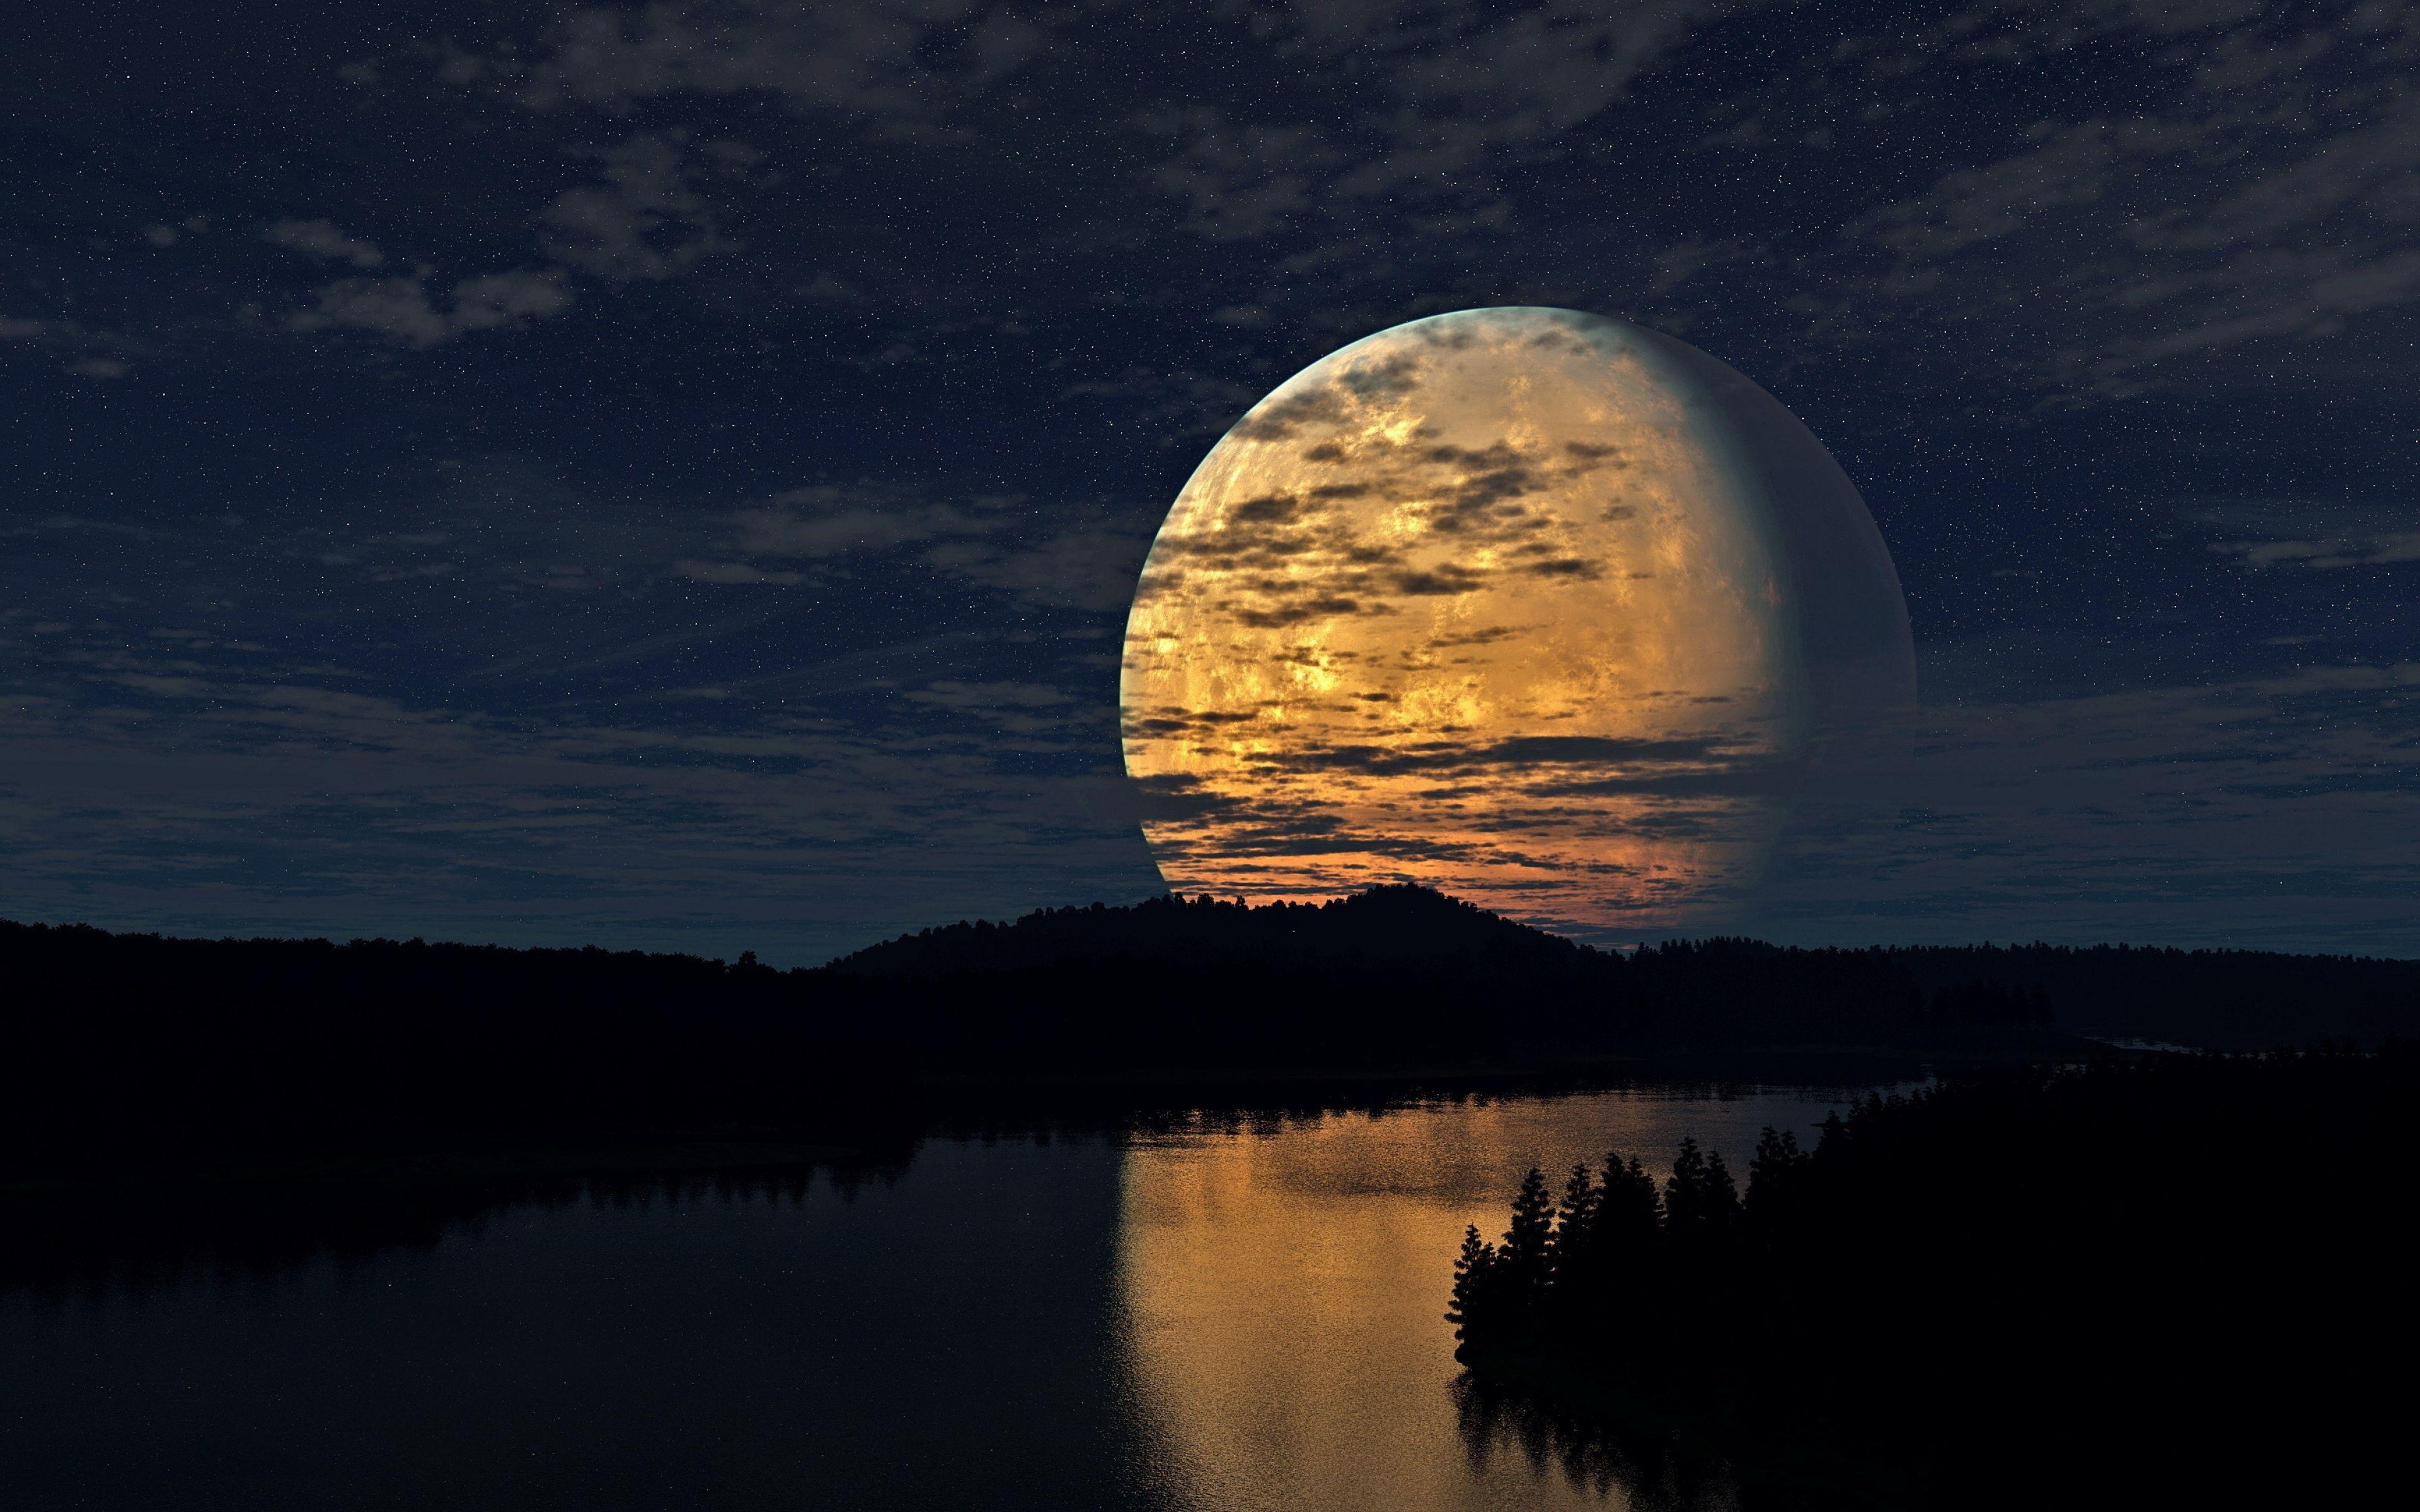 3840x2400 Wallpaper Night Sky Moon Trees River Reflection Night Sky Moon Sky Moon Beautiful Moon